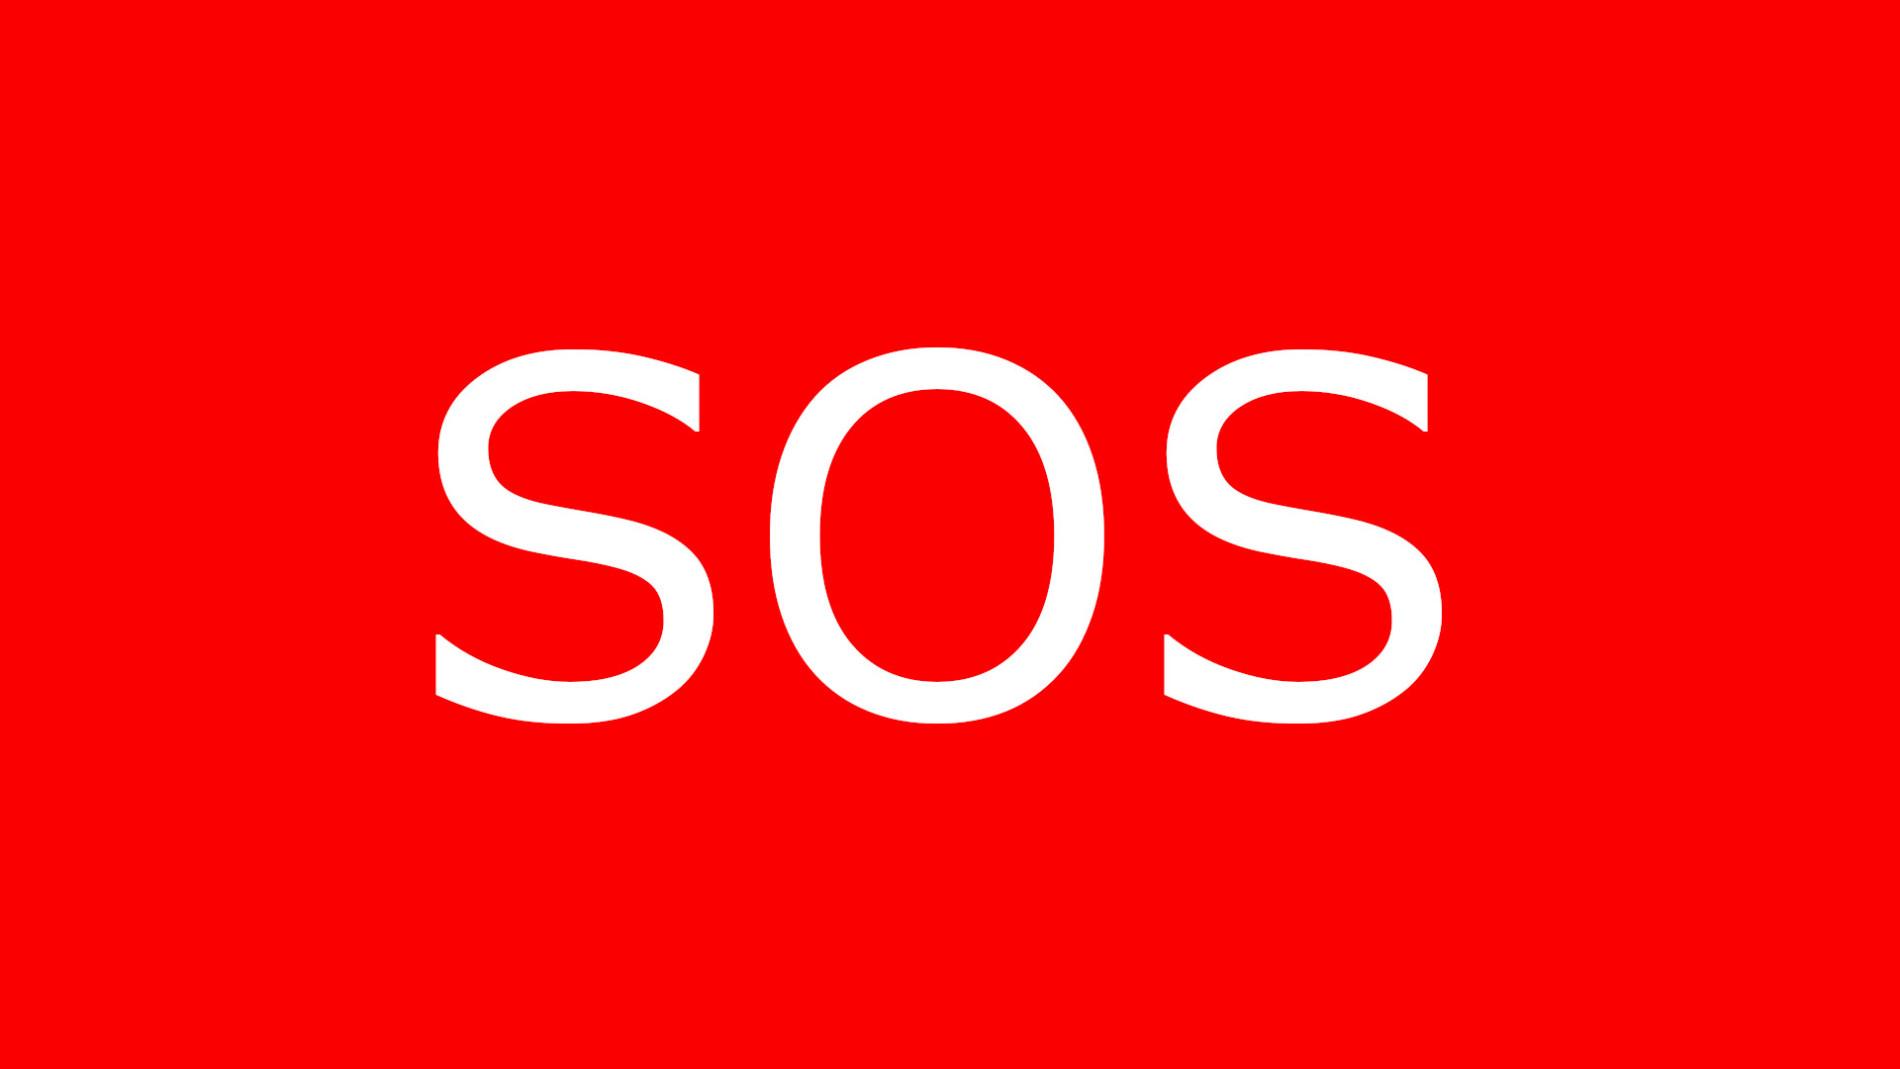 SOS-Dosen im Streutal